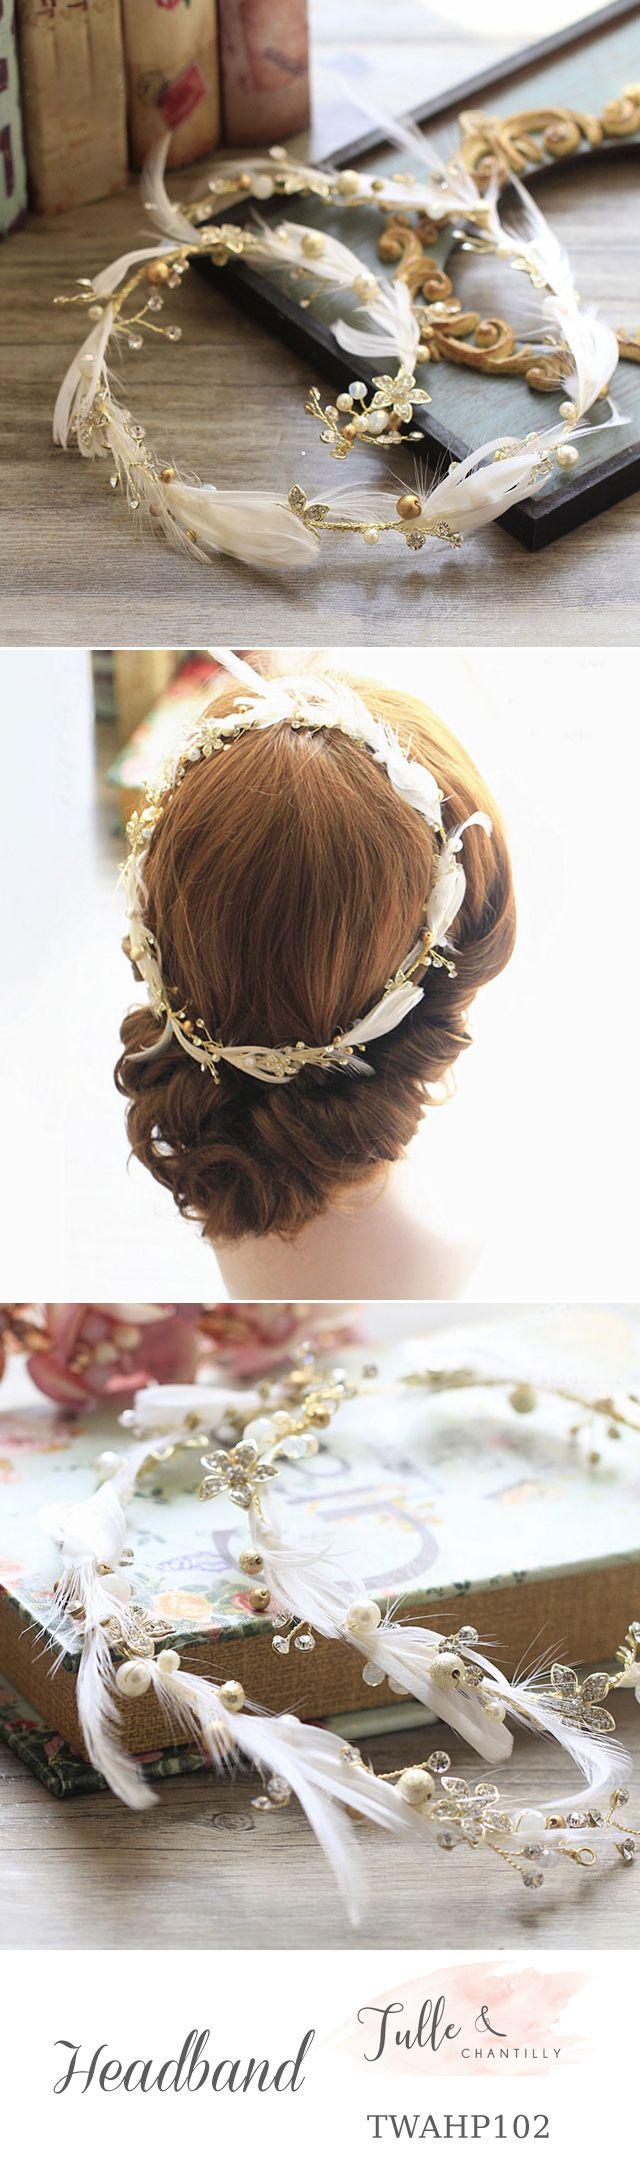 Feather   Bridal Headband Vines Wedding